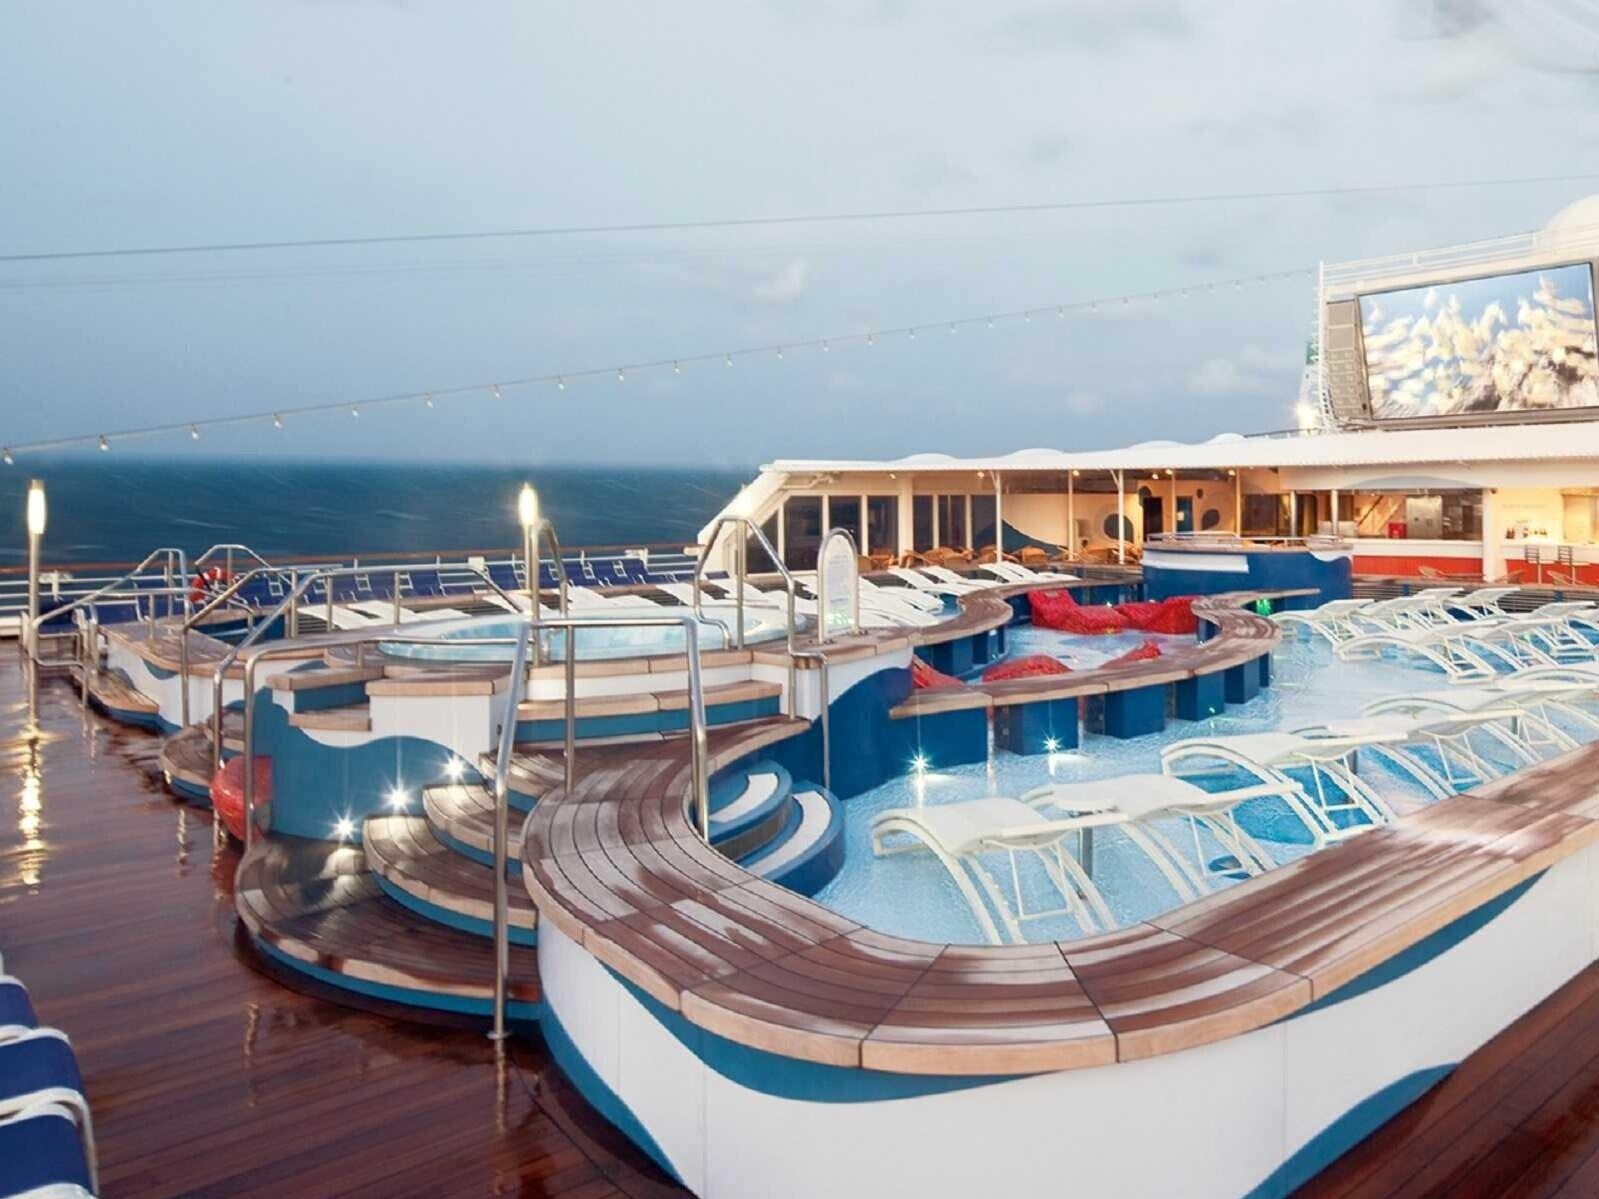 holland-america-cruises-cruise-deals-on-holland-america-rotterdam-1548100605.jpg